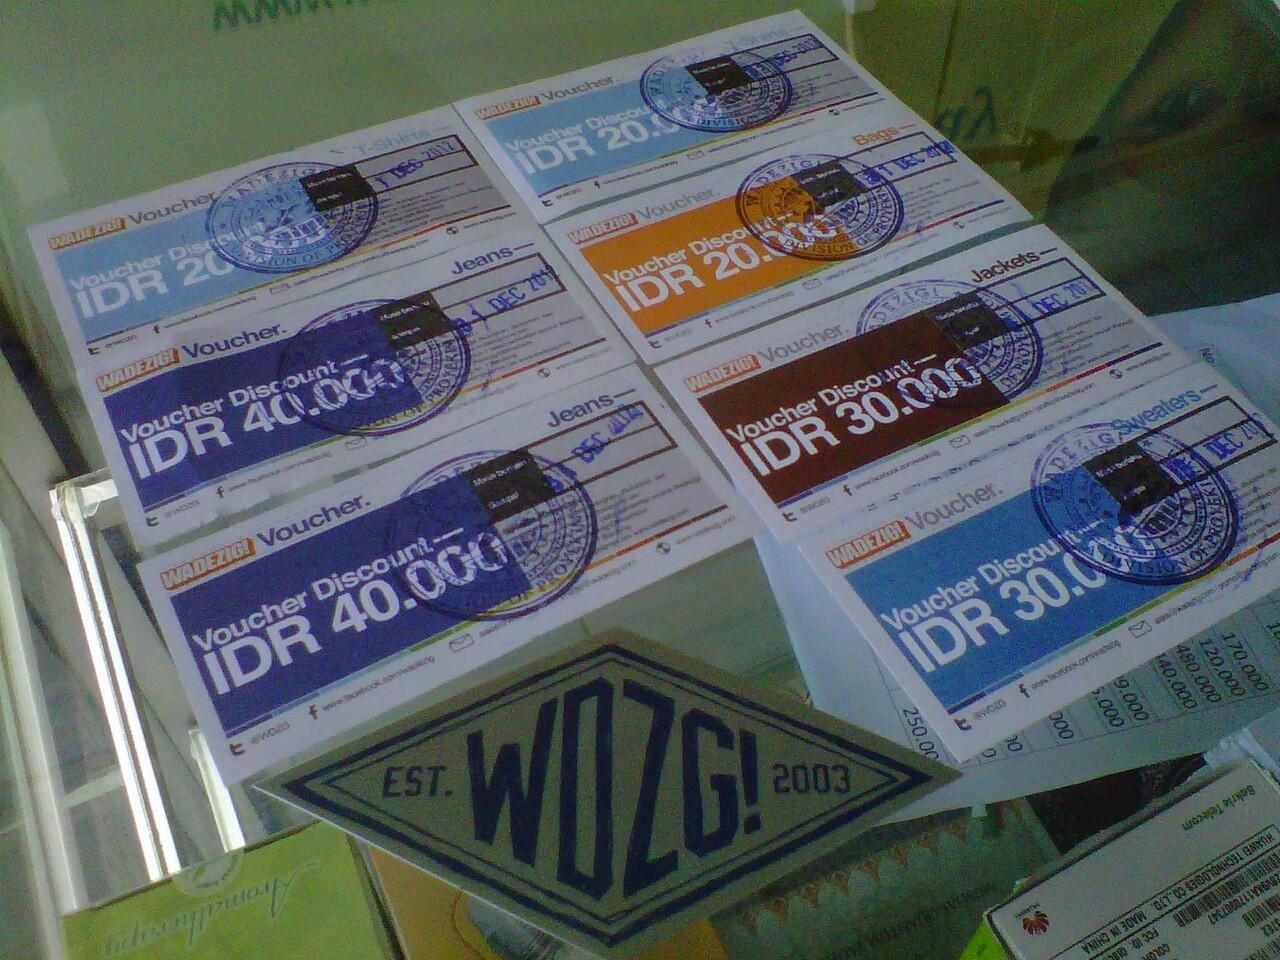 [WADEZIG] Voucher Wadezig 600rb dijual hanya 150rb siapa cepat dia dapat!!!!